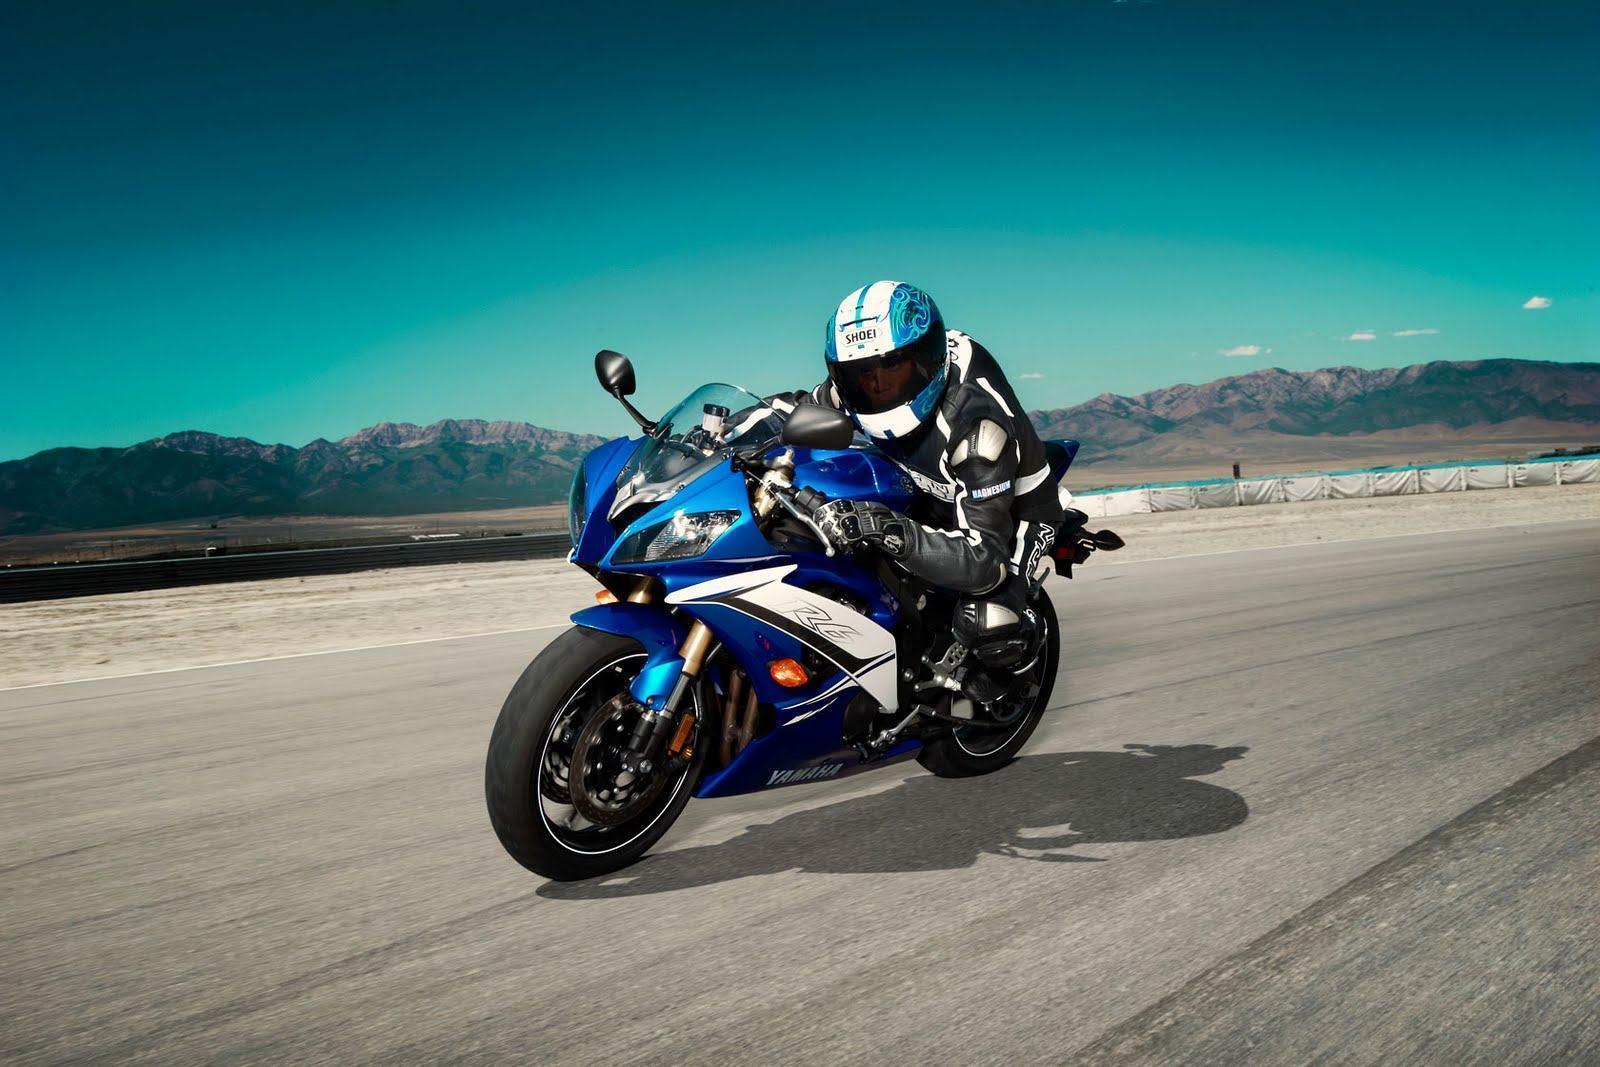 Sport Bike Wallpaper Desktop Backgrounds: Yamaha R6 Wallpapers